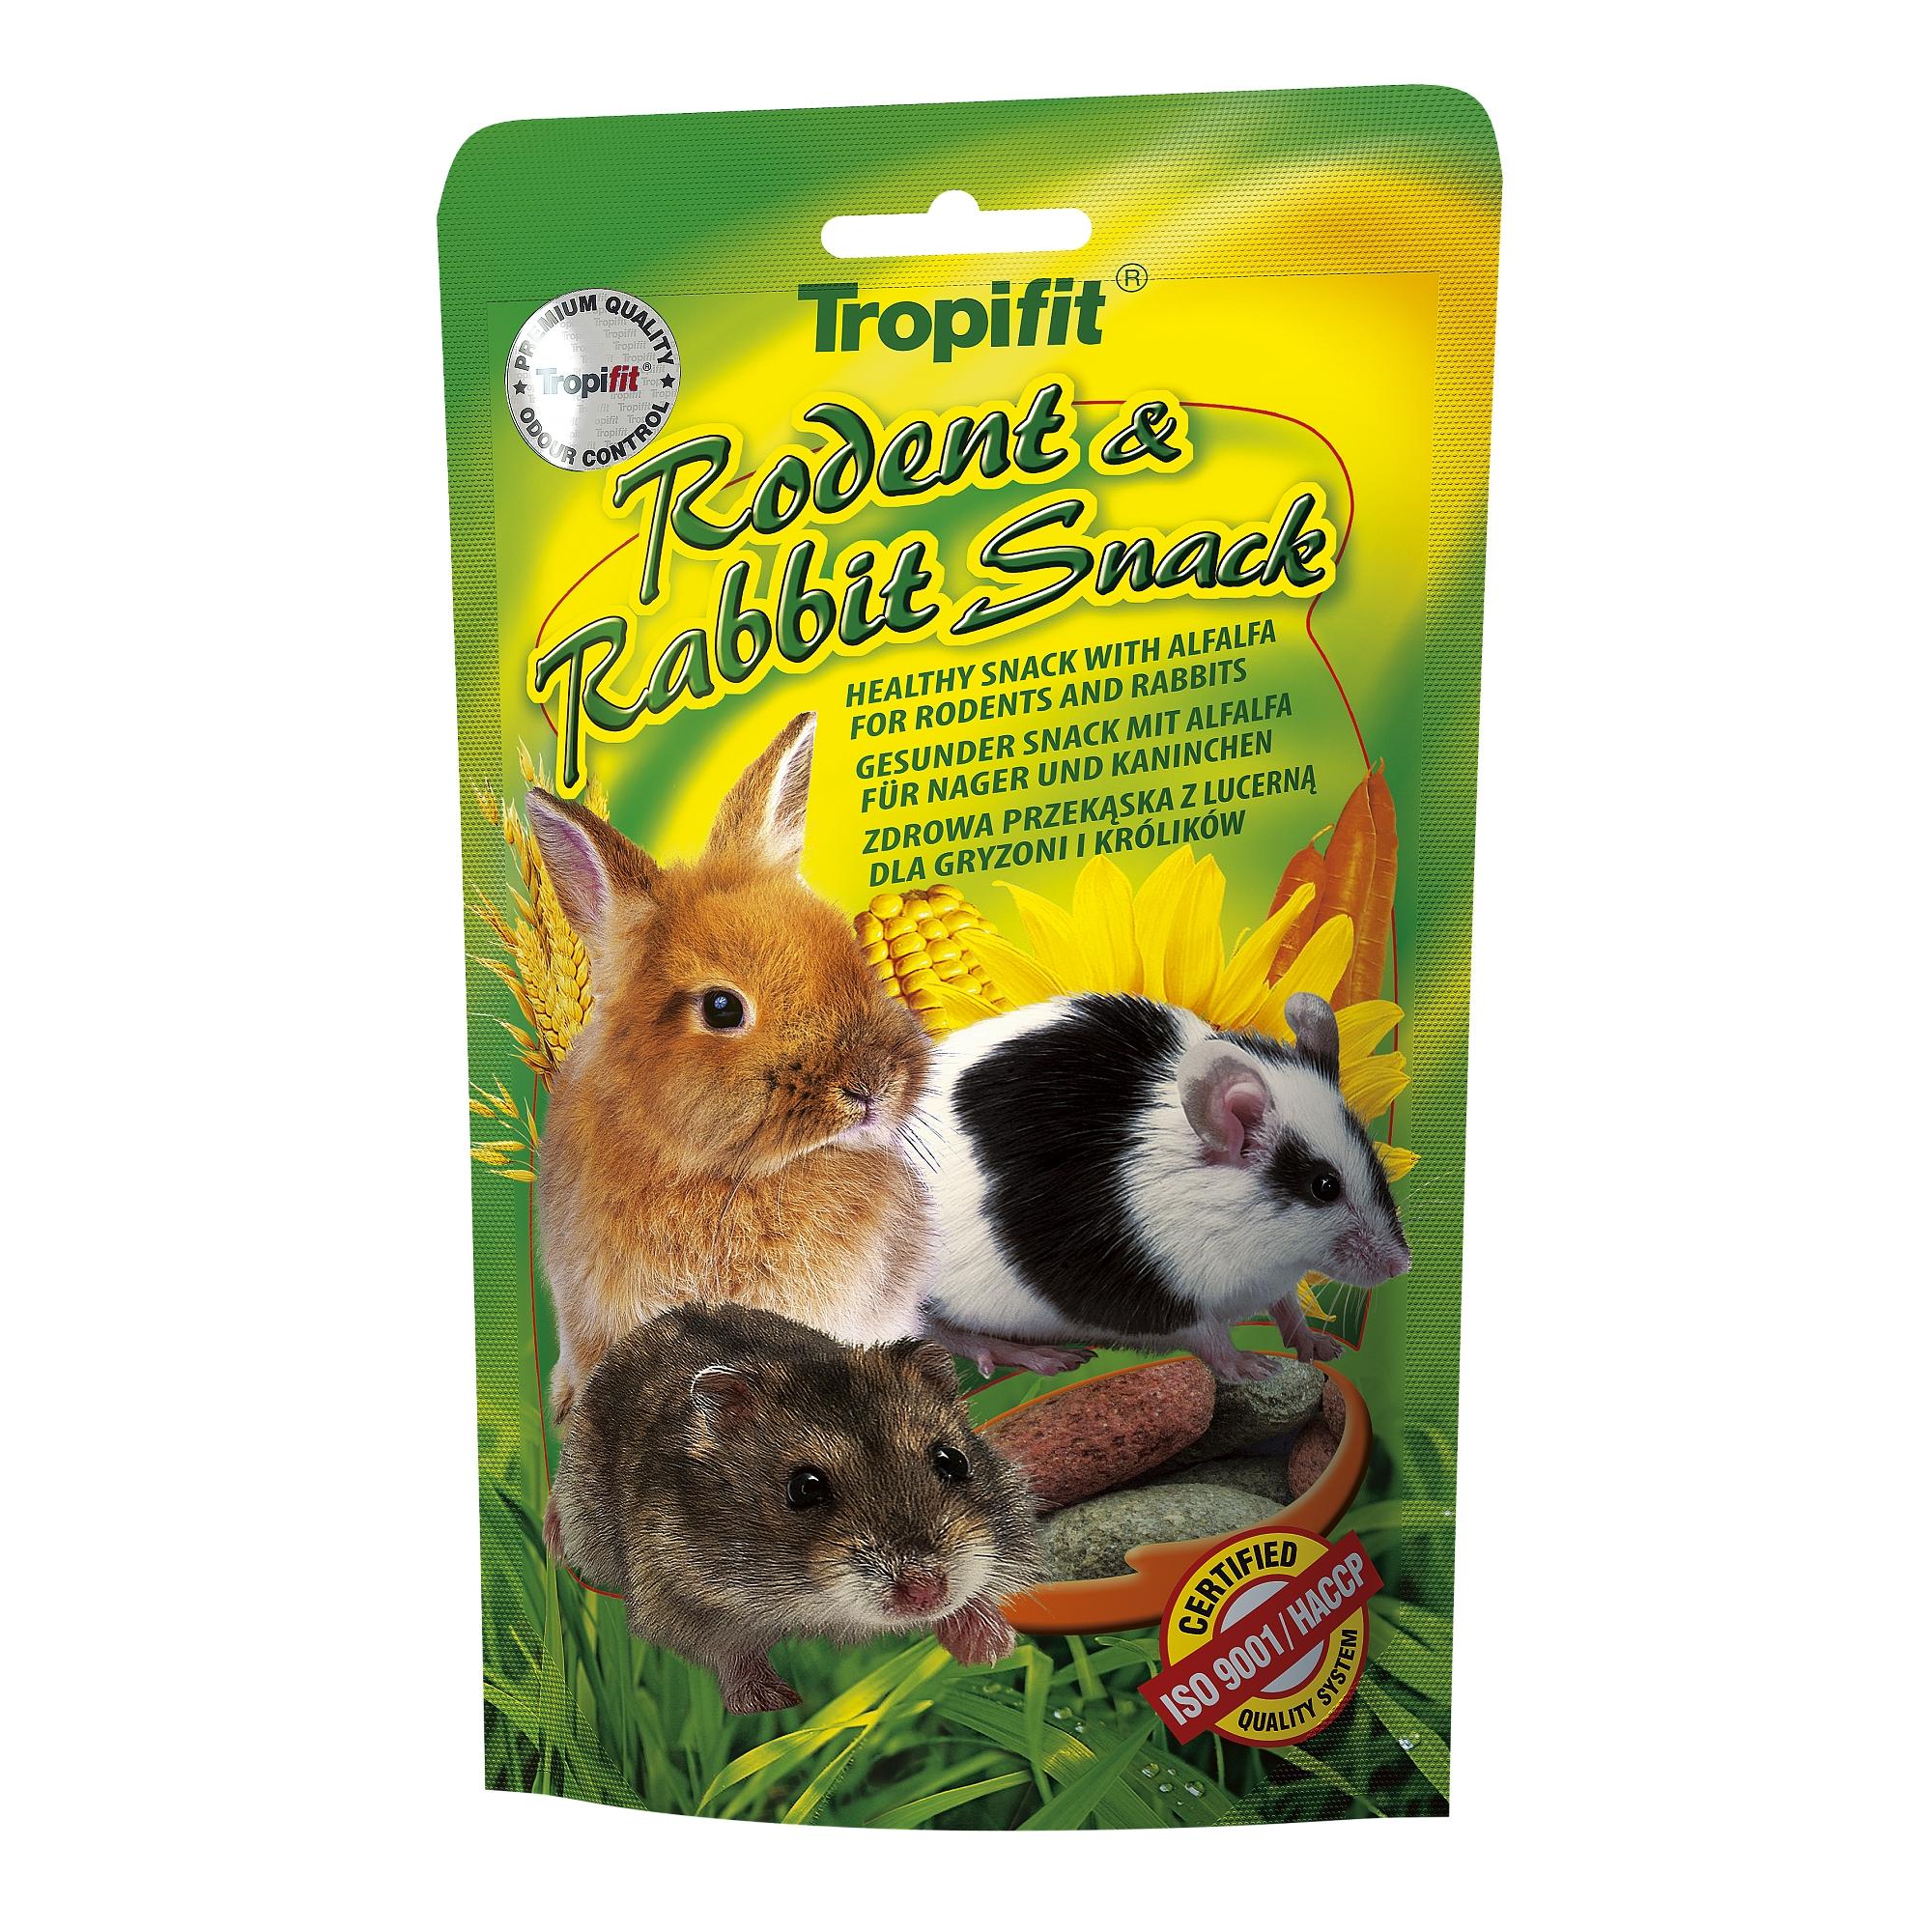 Tropifit Rodents & Rabbit Snack - 110g